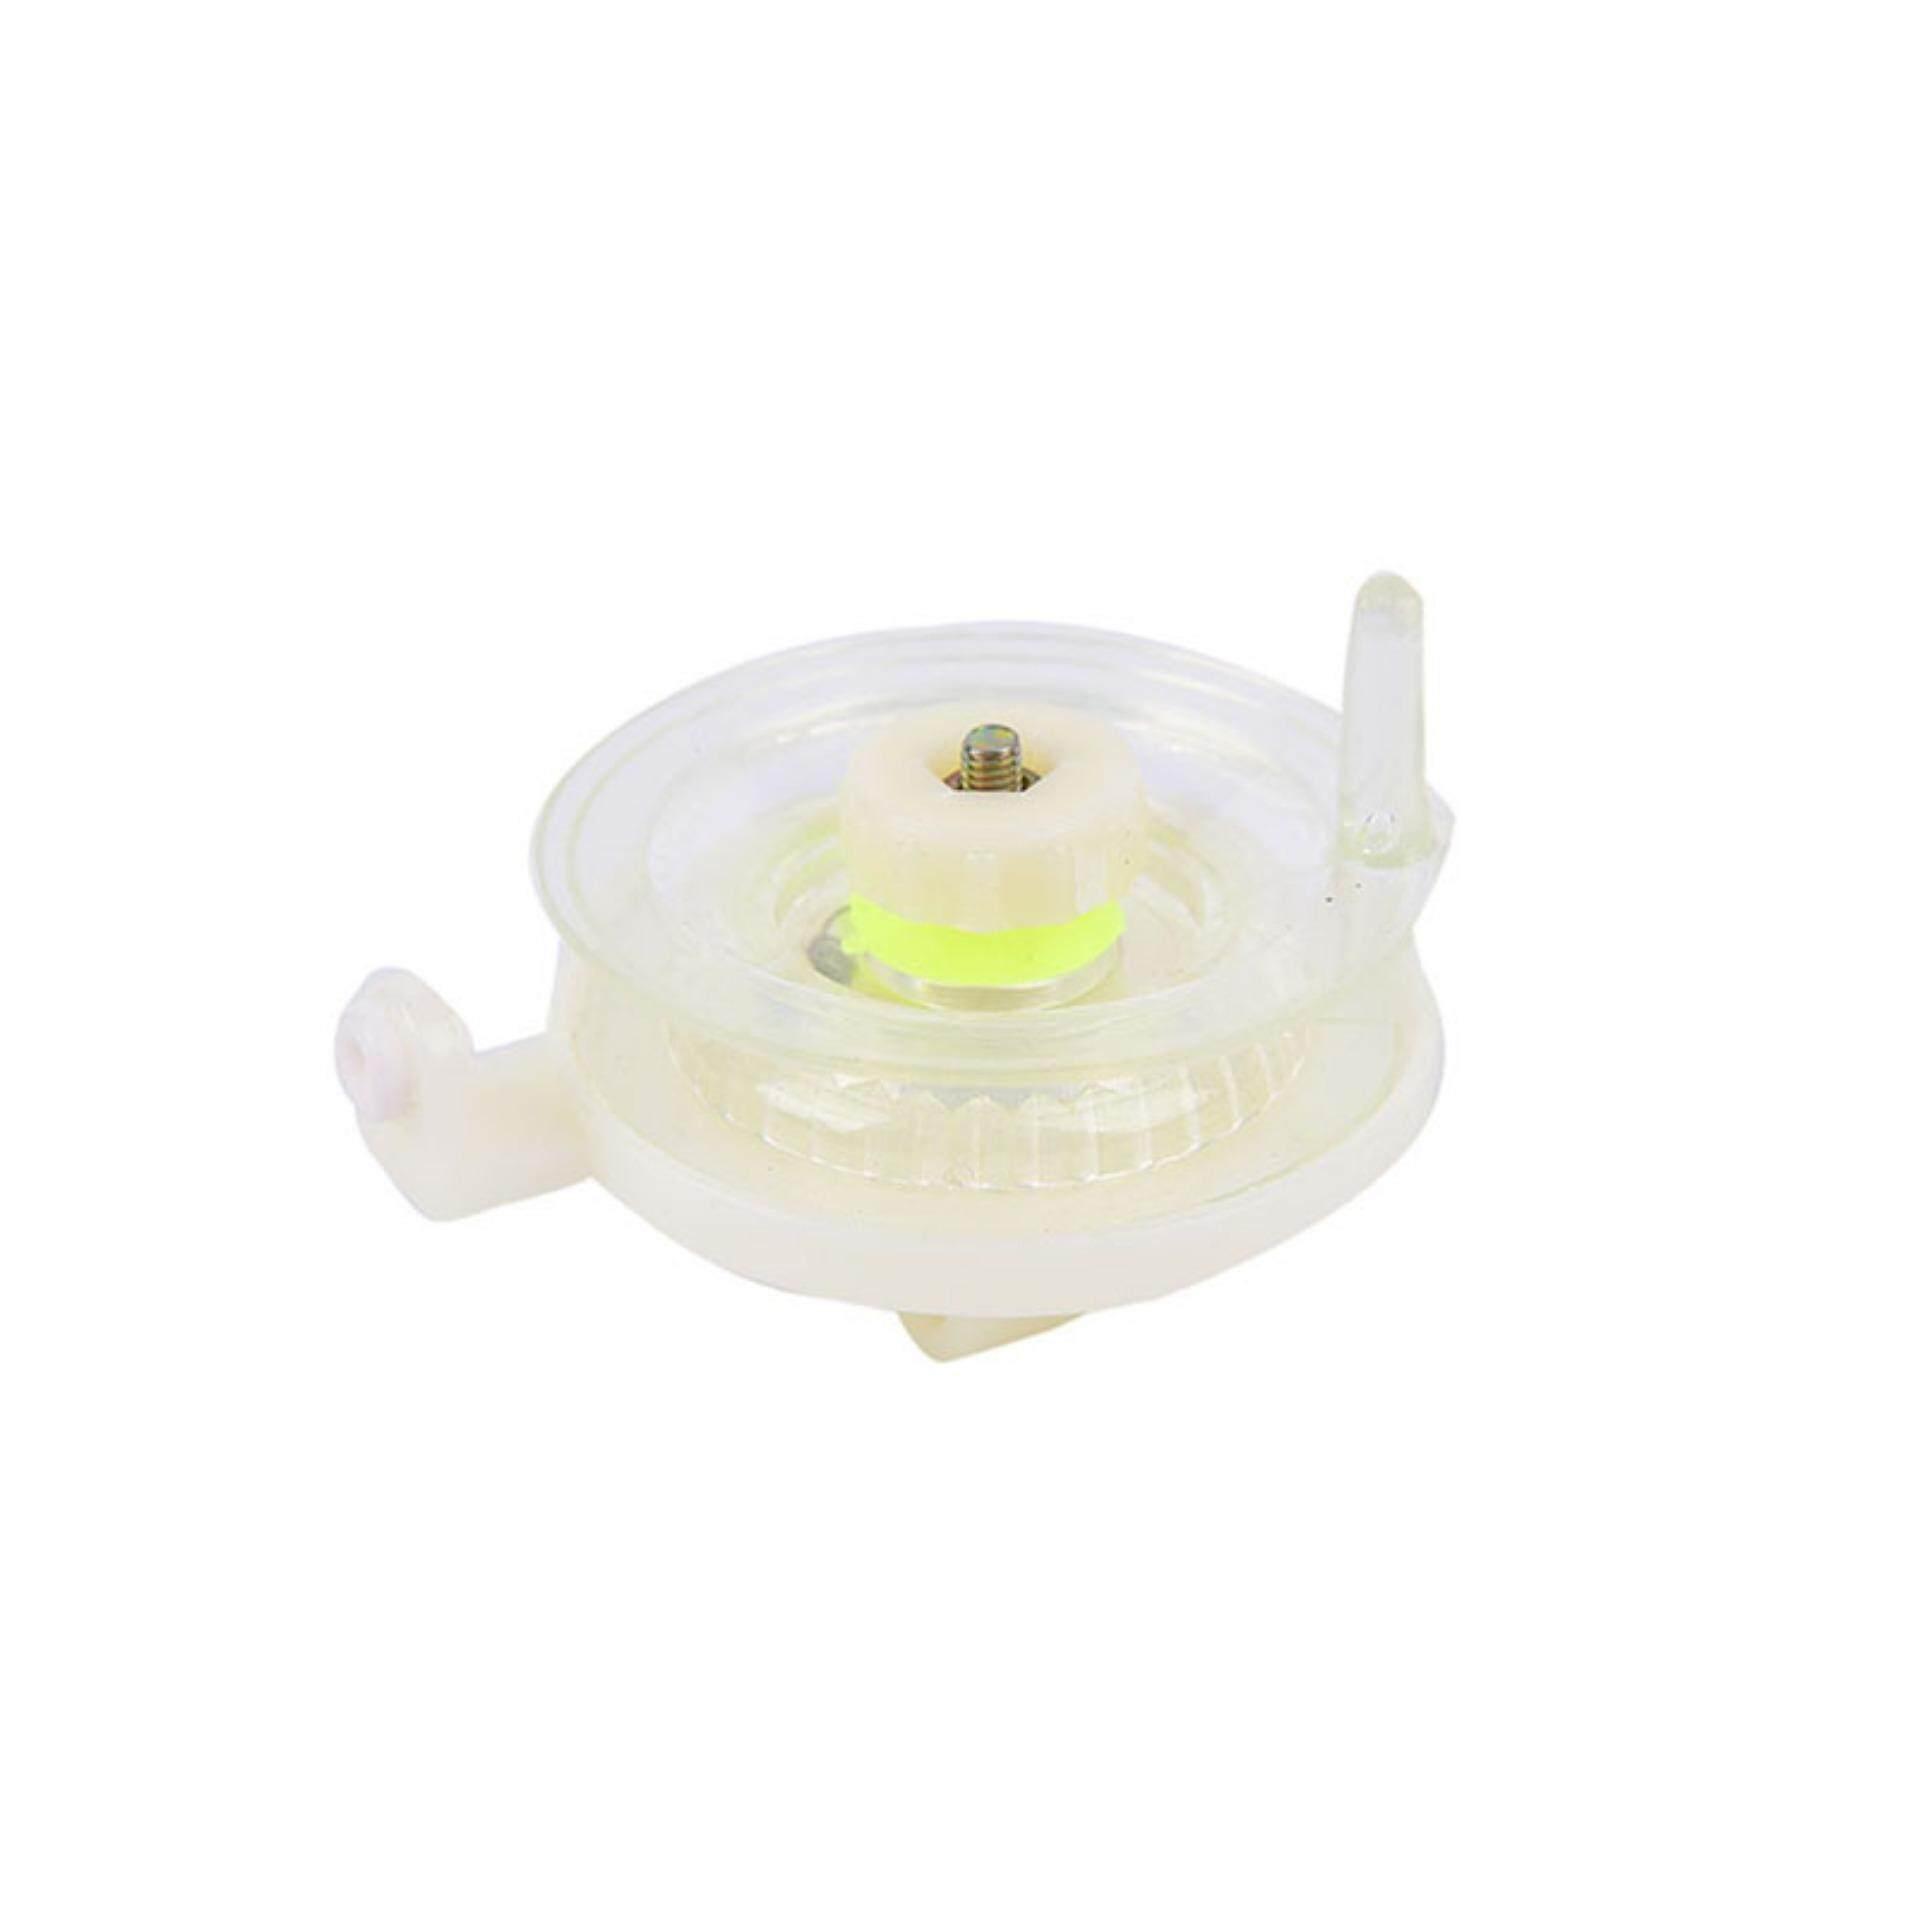 20g Plastic Fishing Reel Ice Sea Wheel Fly Fishing Reel Coil Feeder White S